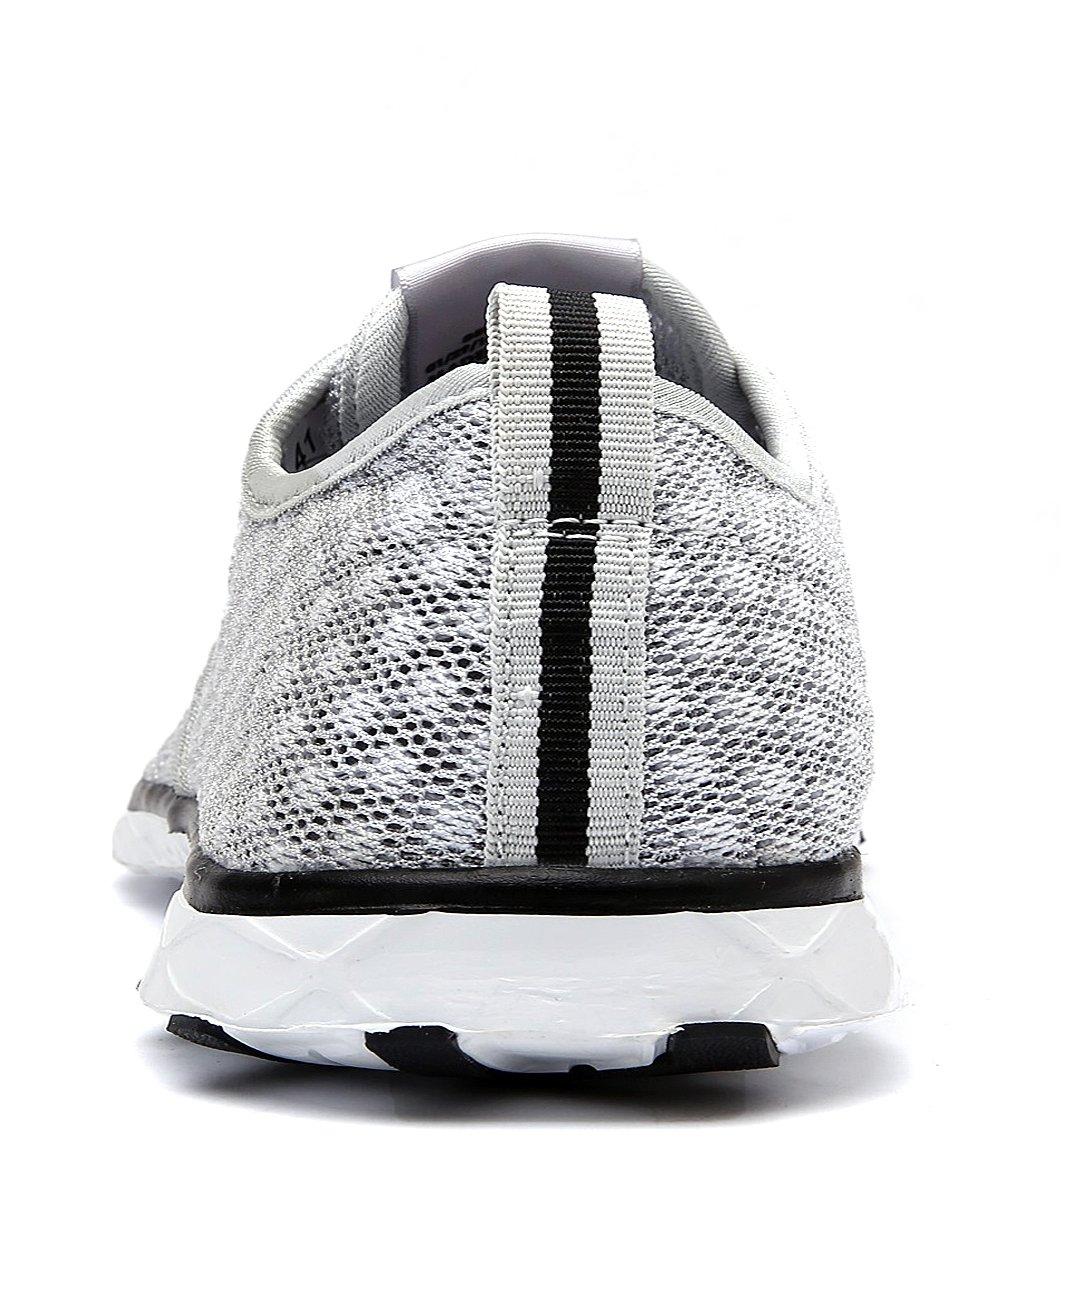 Dreamcity Women's Water Shoes Athletic Sport Lightweight Walking Shoes B06XR7GV6D 8 B(M) US,Grey